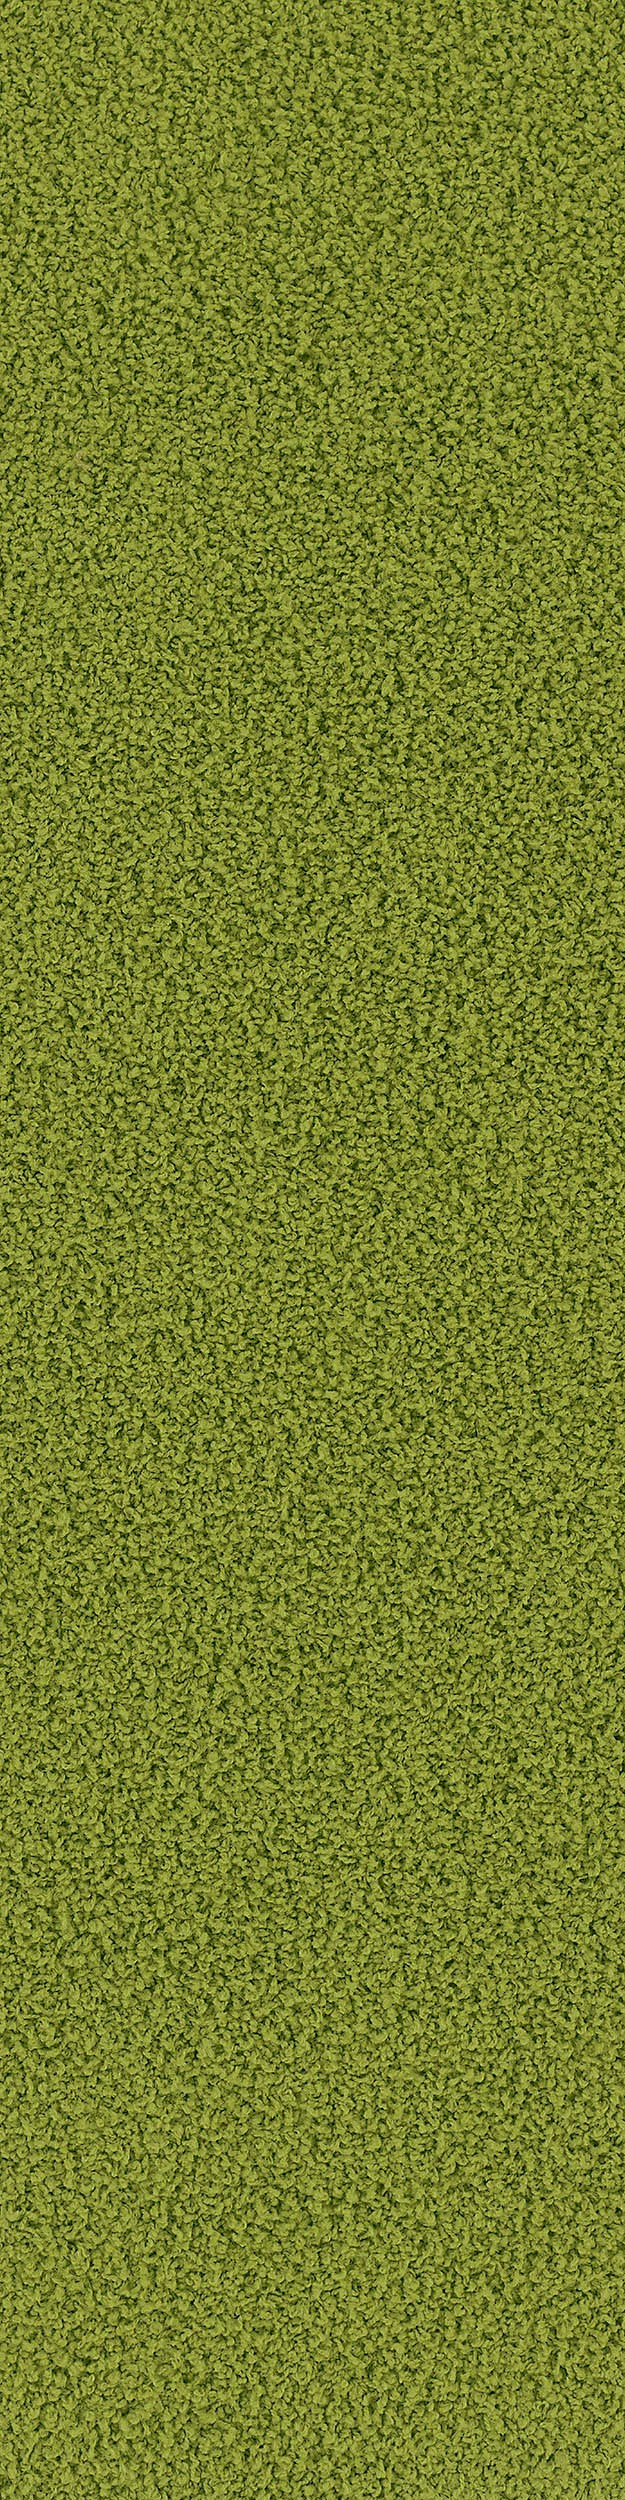 Interface Human Nature 830 Kiwi 608006 Human Nature 830